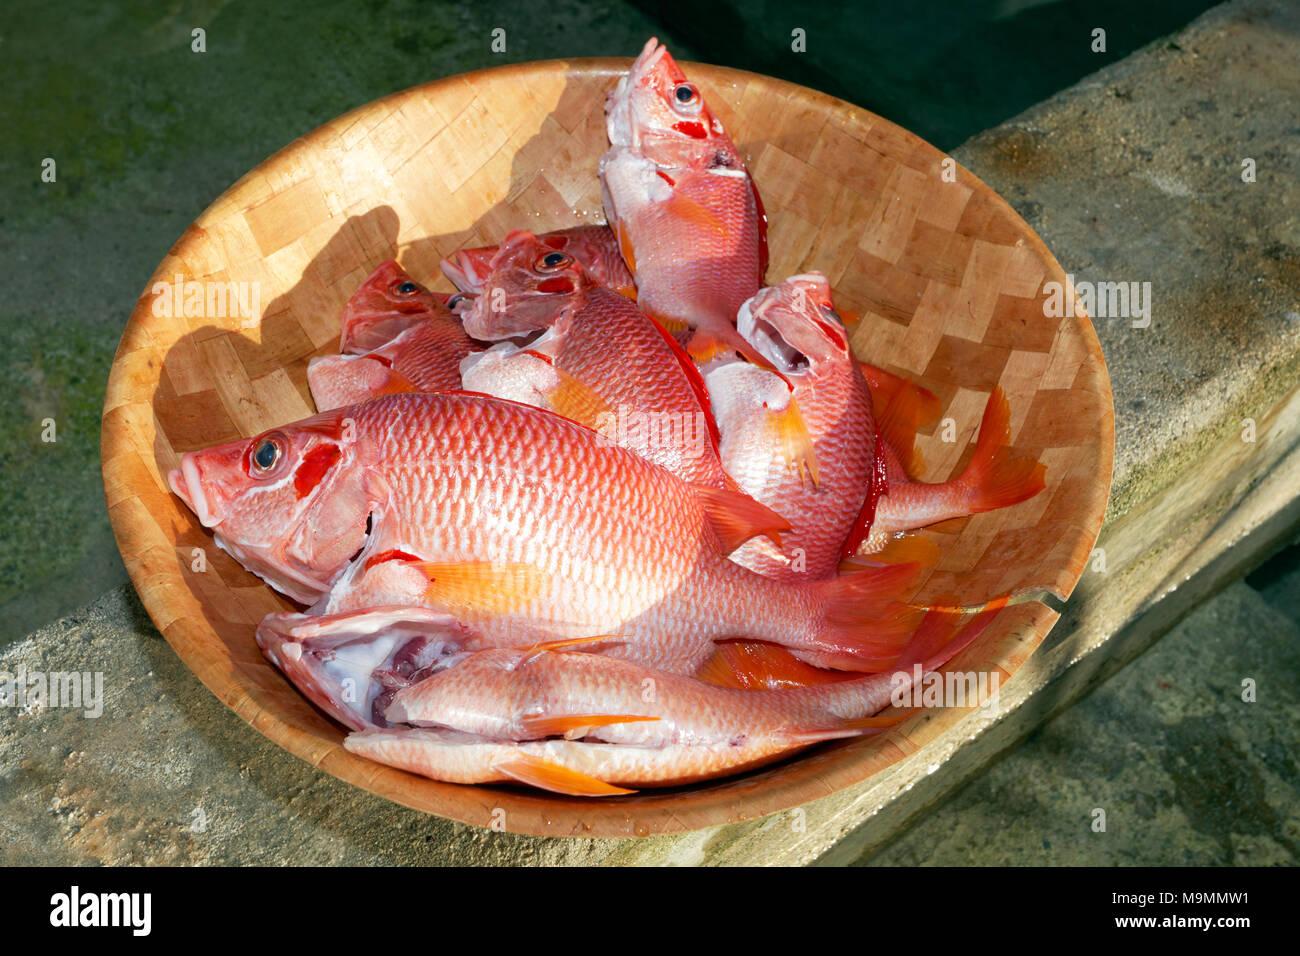 Red edible fish in a bowl, Sabre squirrelfish (Sargocentron spiniferum), Tikehau Atoll, Tuamotu Archipelago, Society Islands - Stock Image